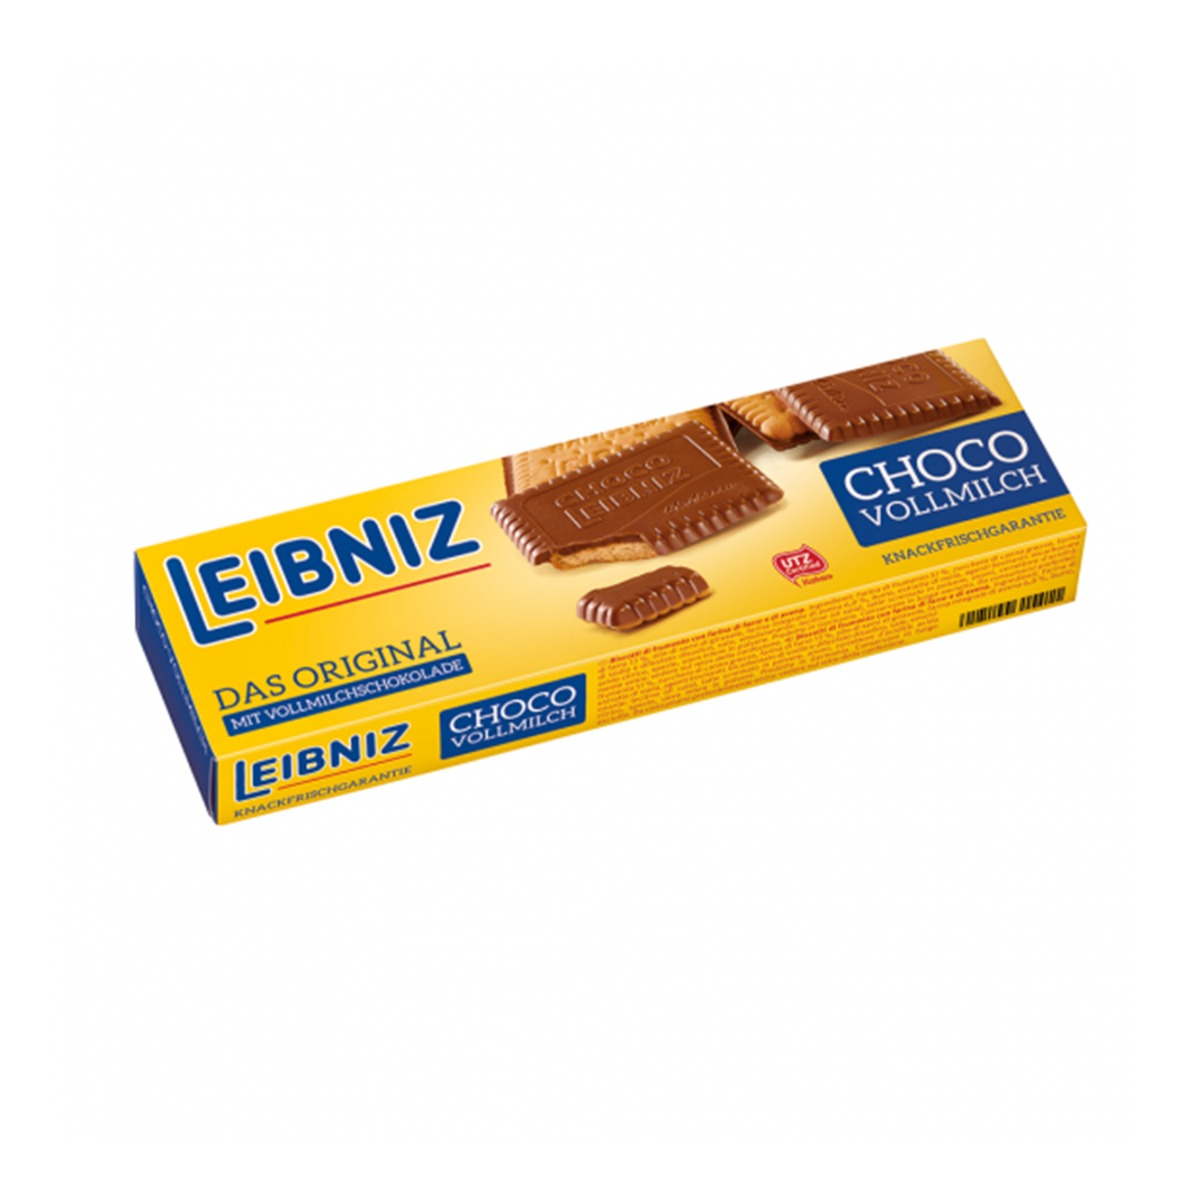 Biscuiti cu ciocolata Leibniz, 125 g imagine